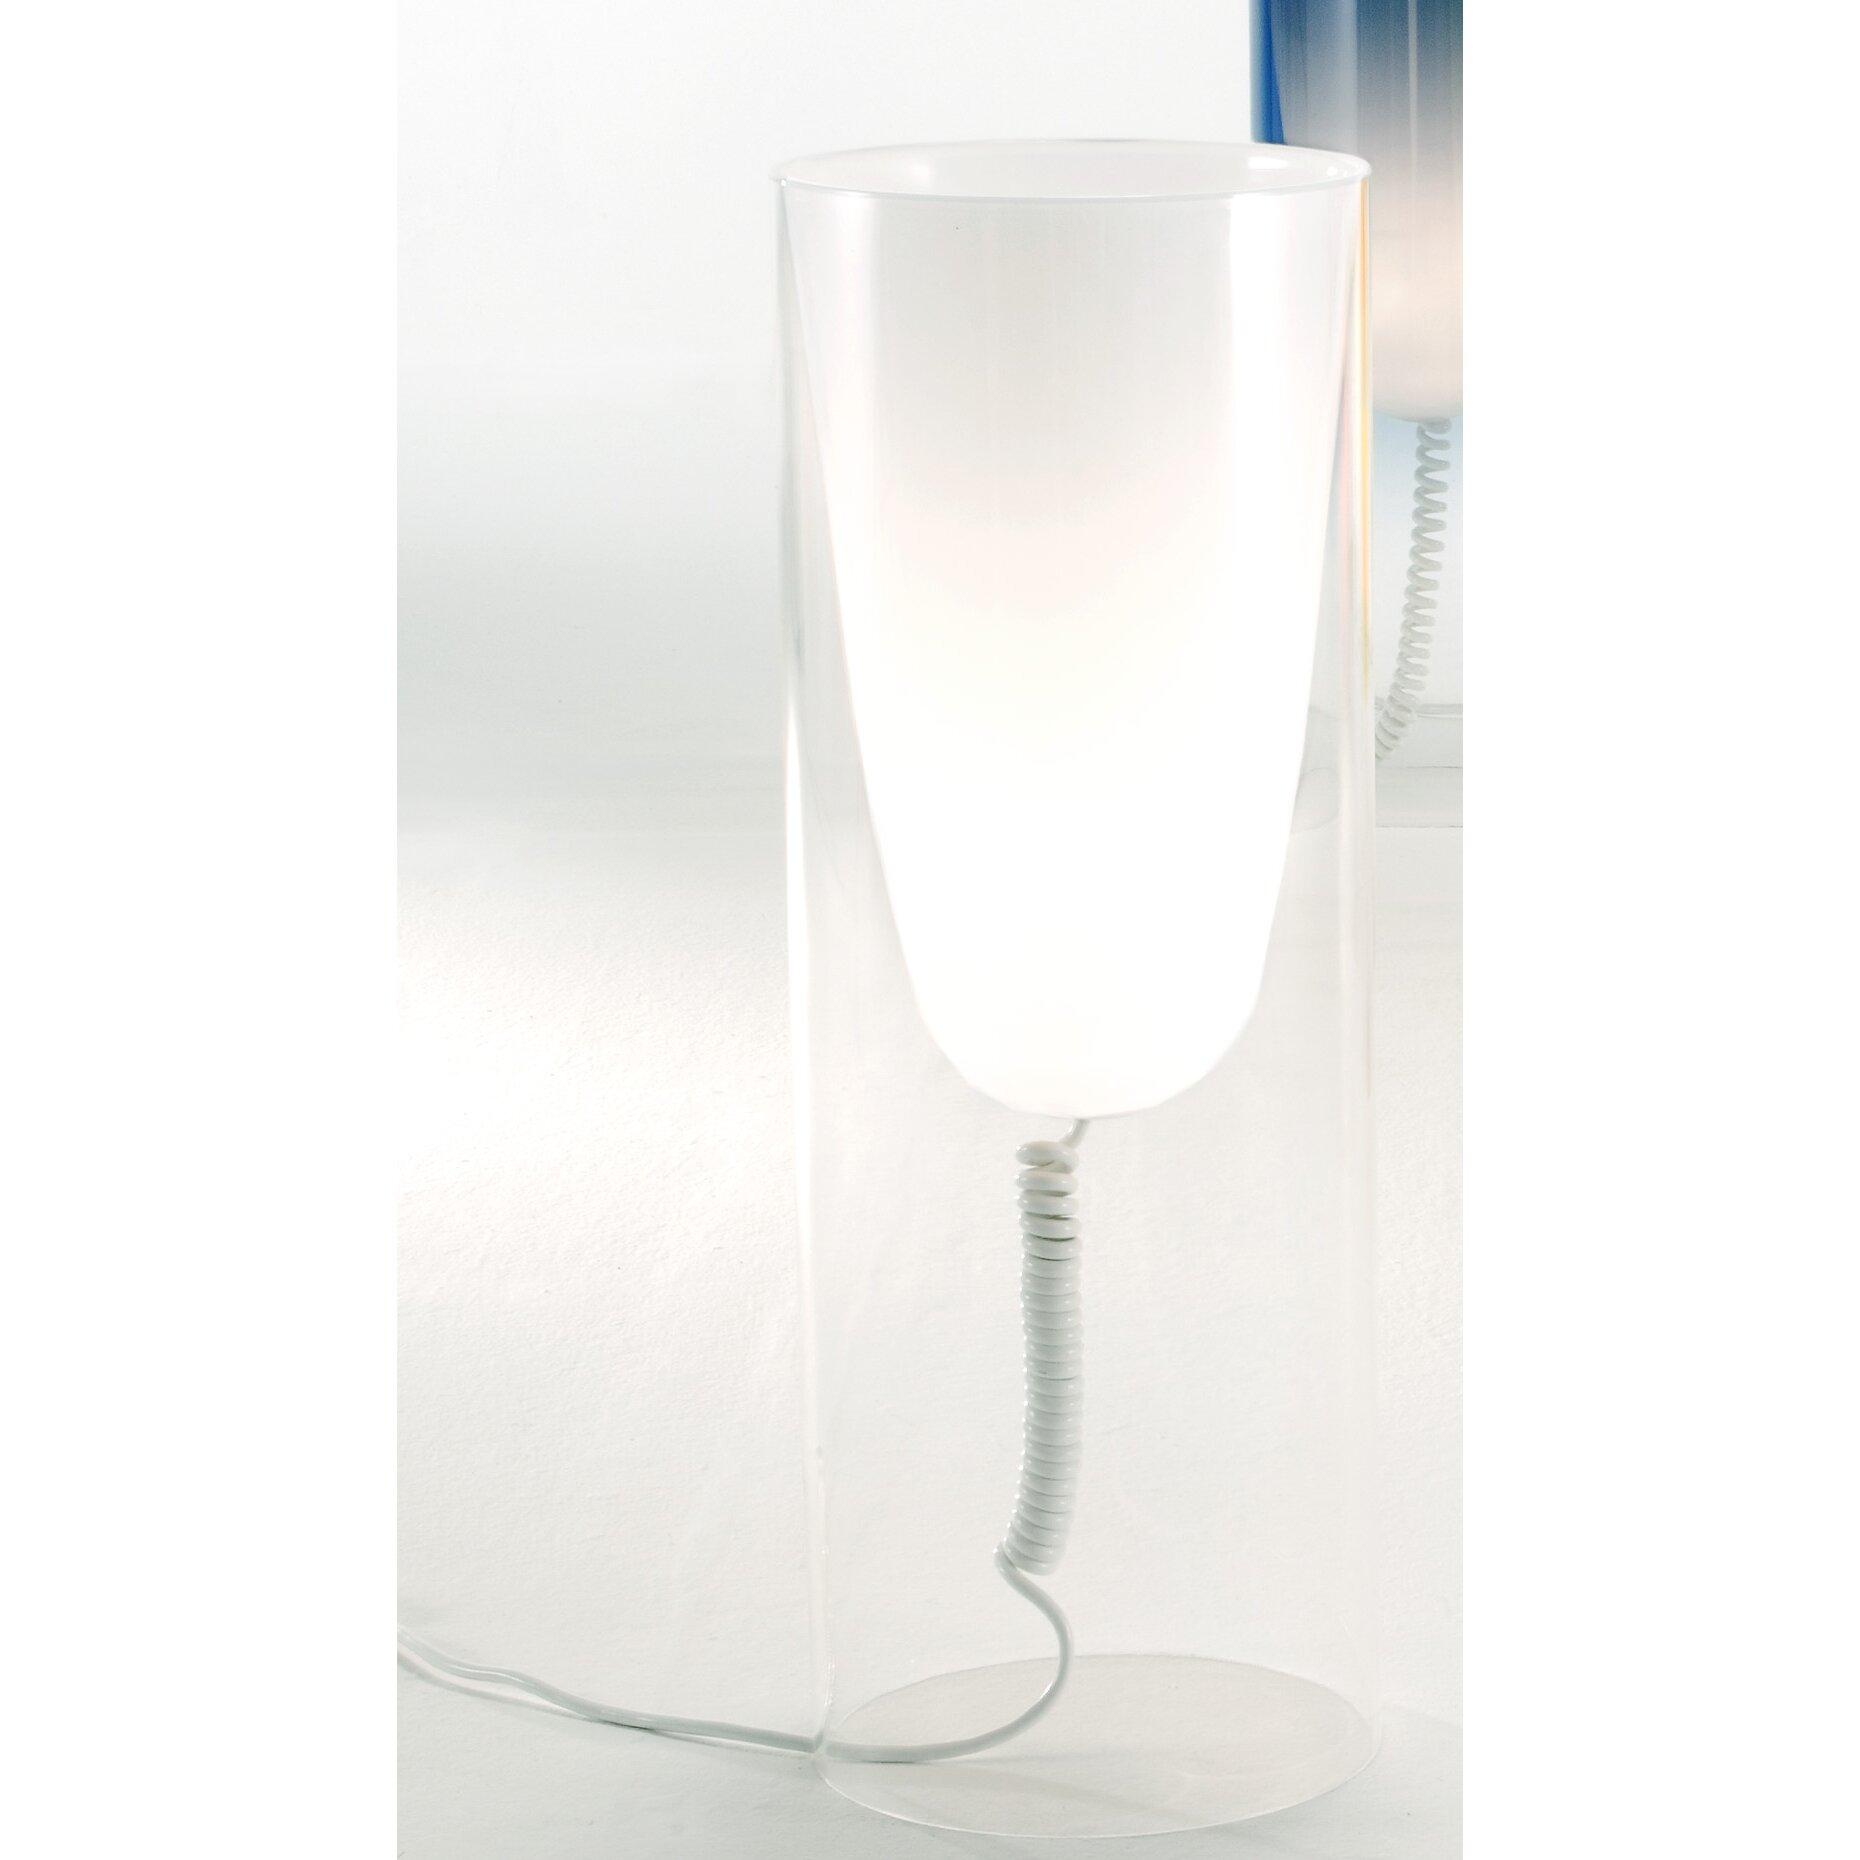 Kartell toobe table lamp reviews wayfair - Toobe kartell ...